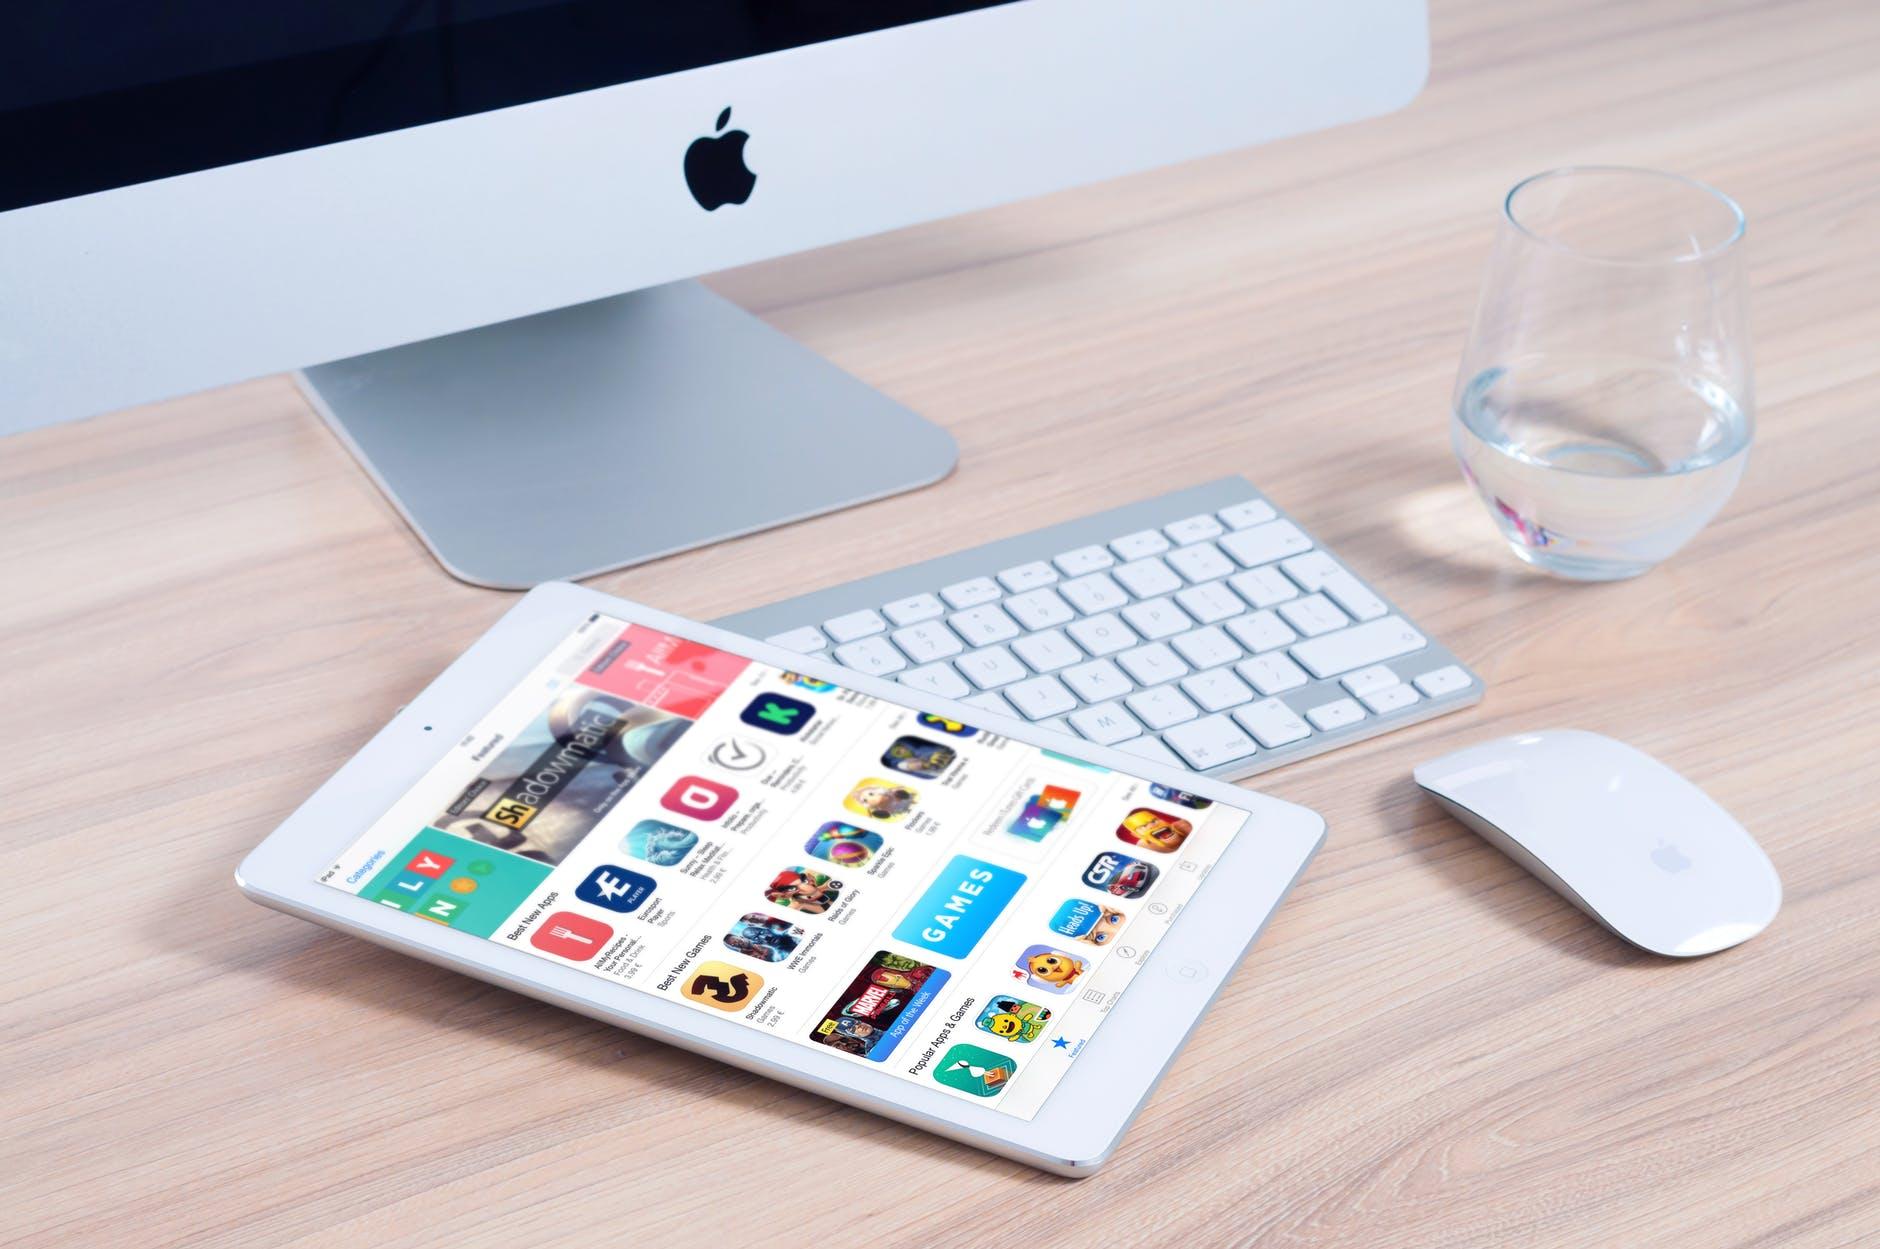 imac-apple-mockup-app